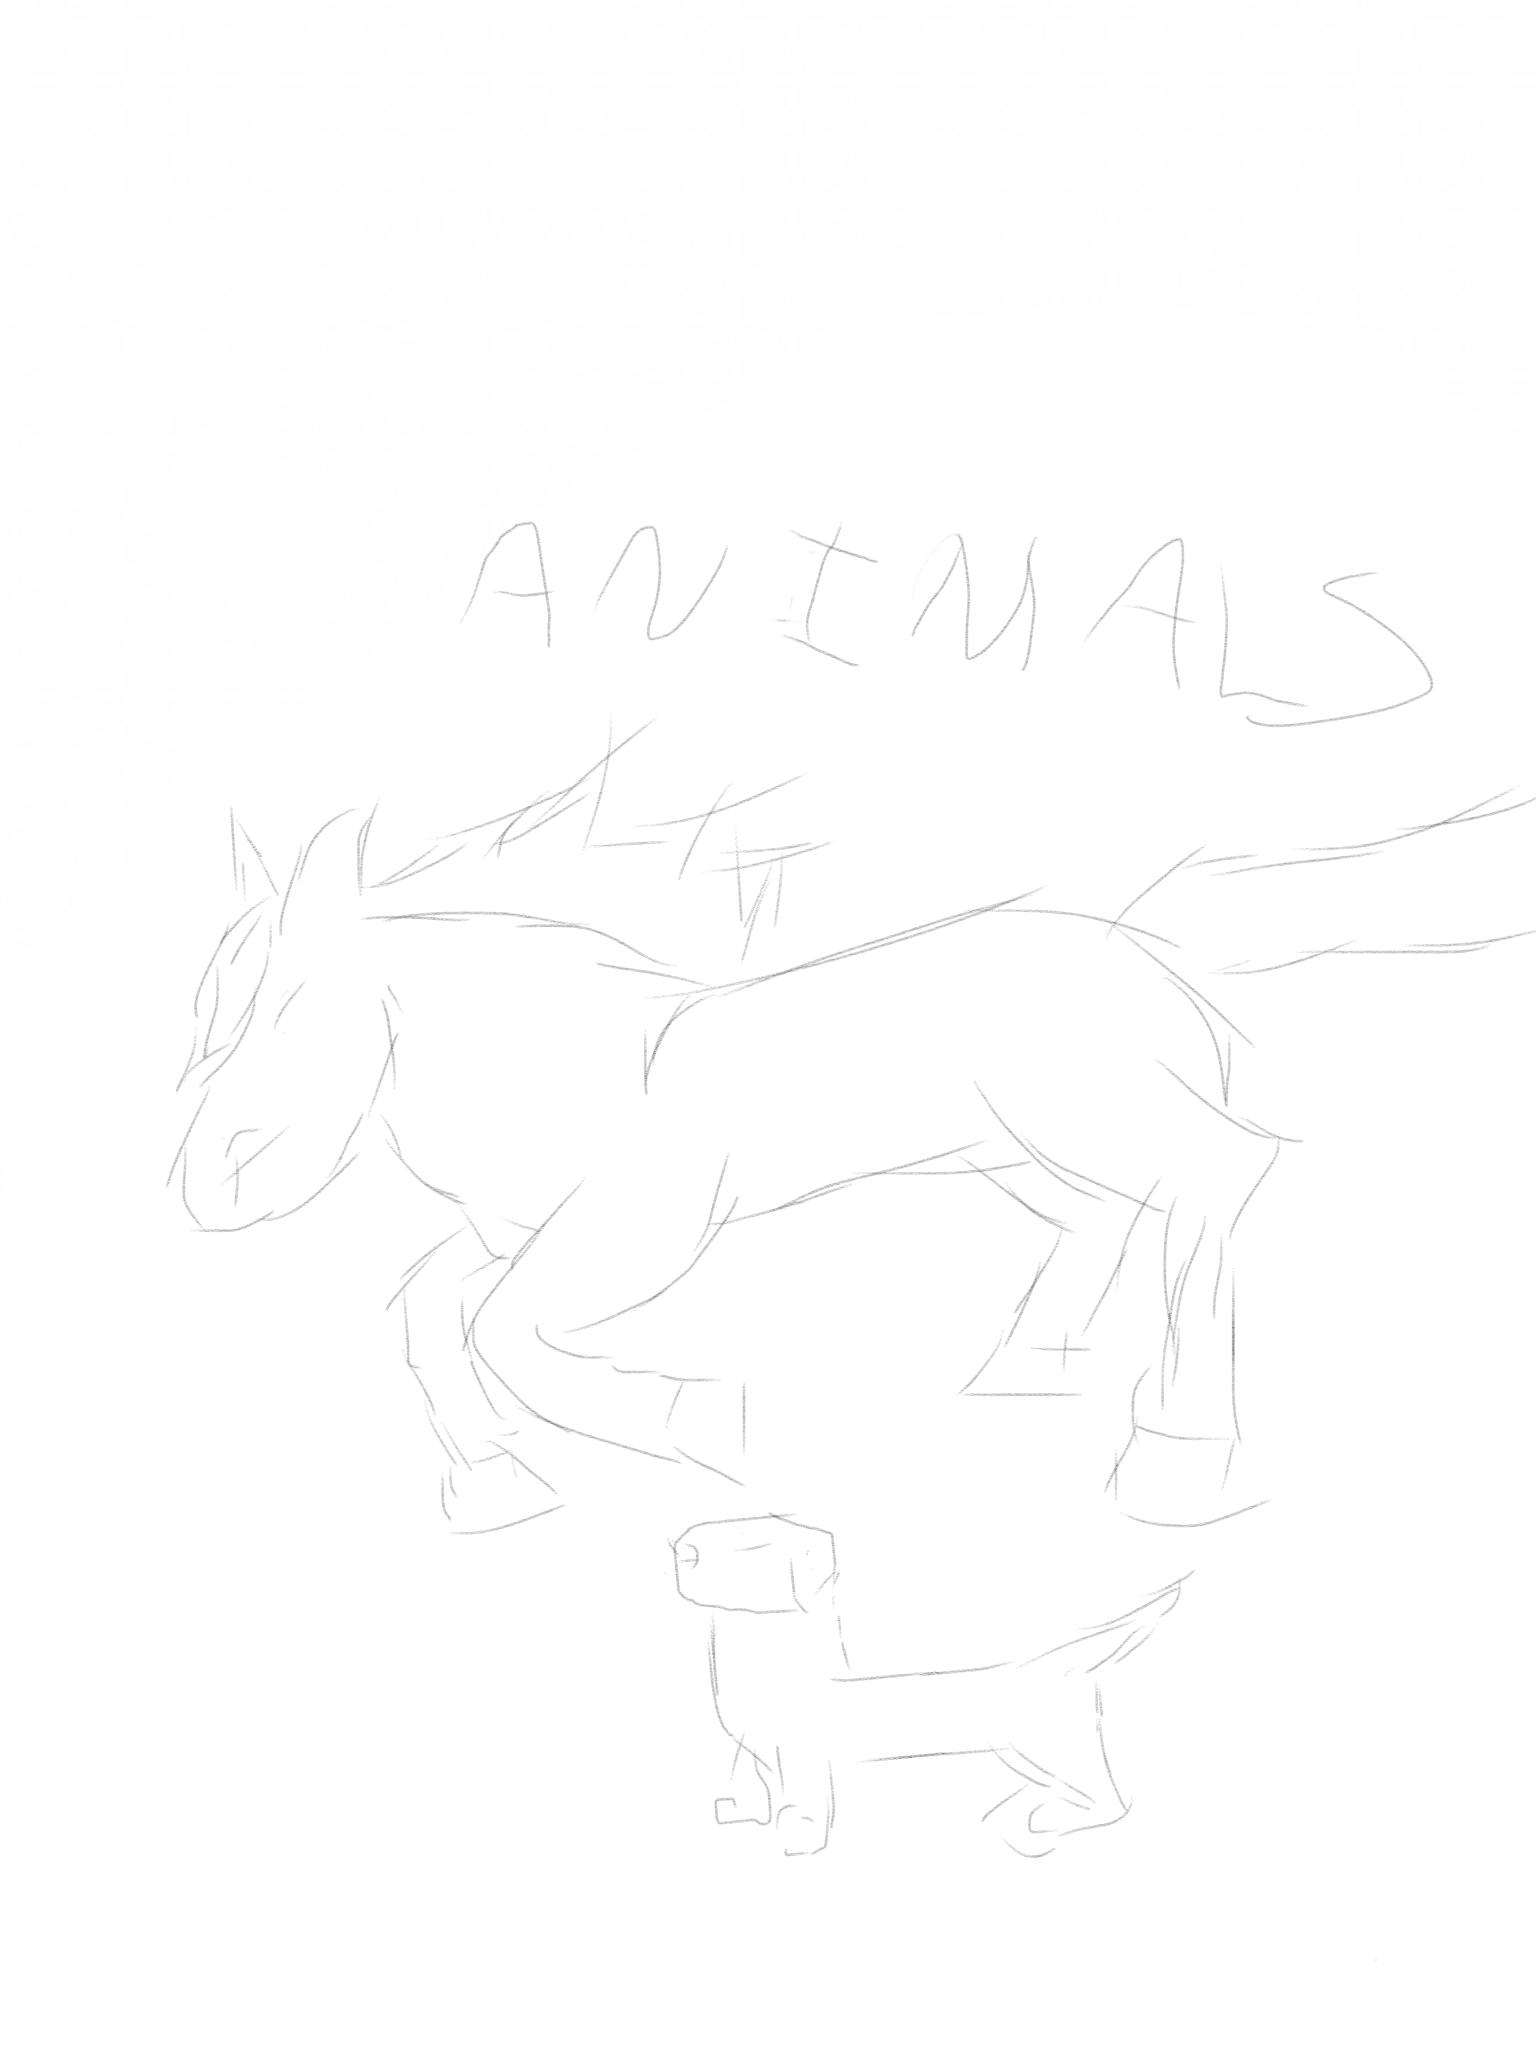 Digital Drawing for WEEK 11 (4th Grade)